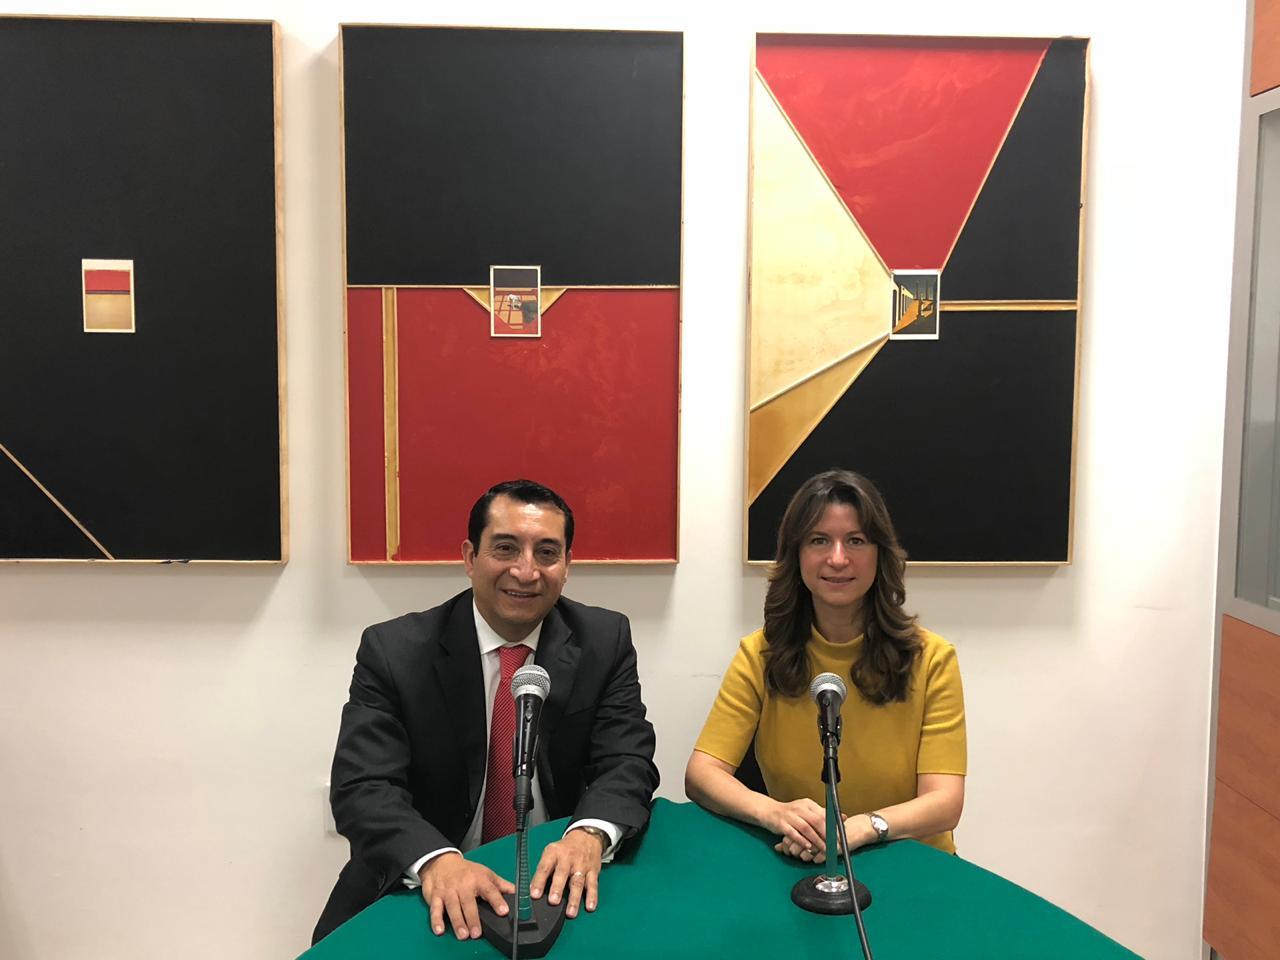 Min. Julián Juárez Cadenas y Dra. Natalia Saltalamacchia